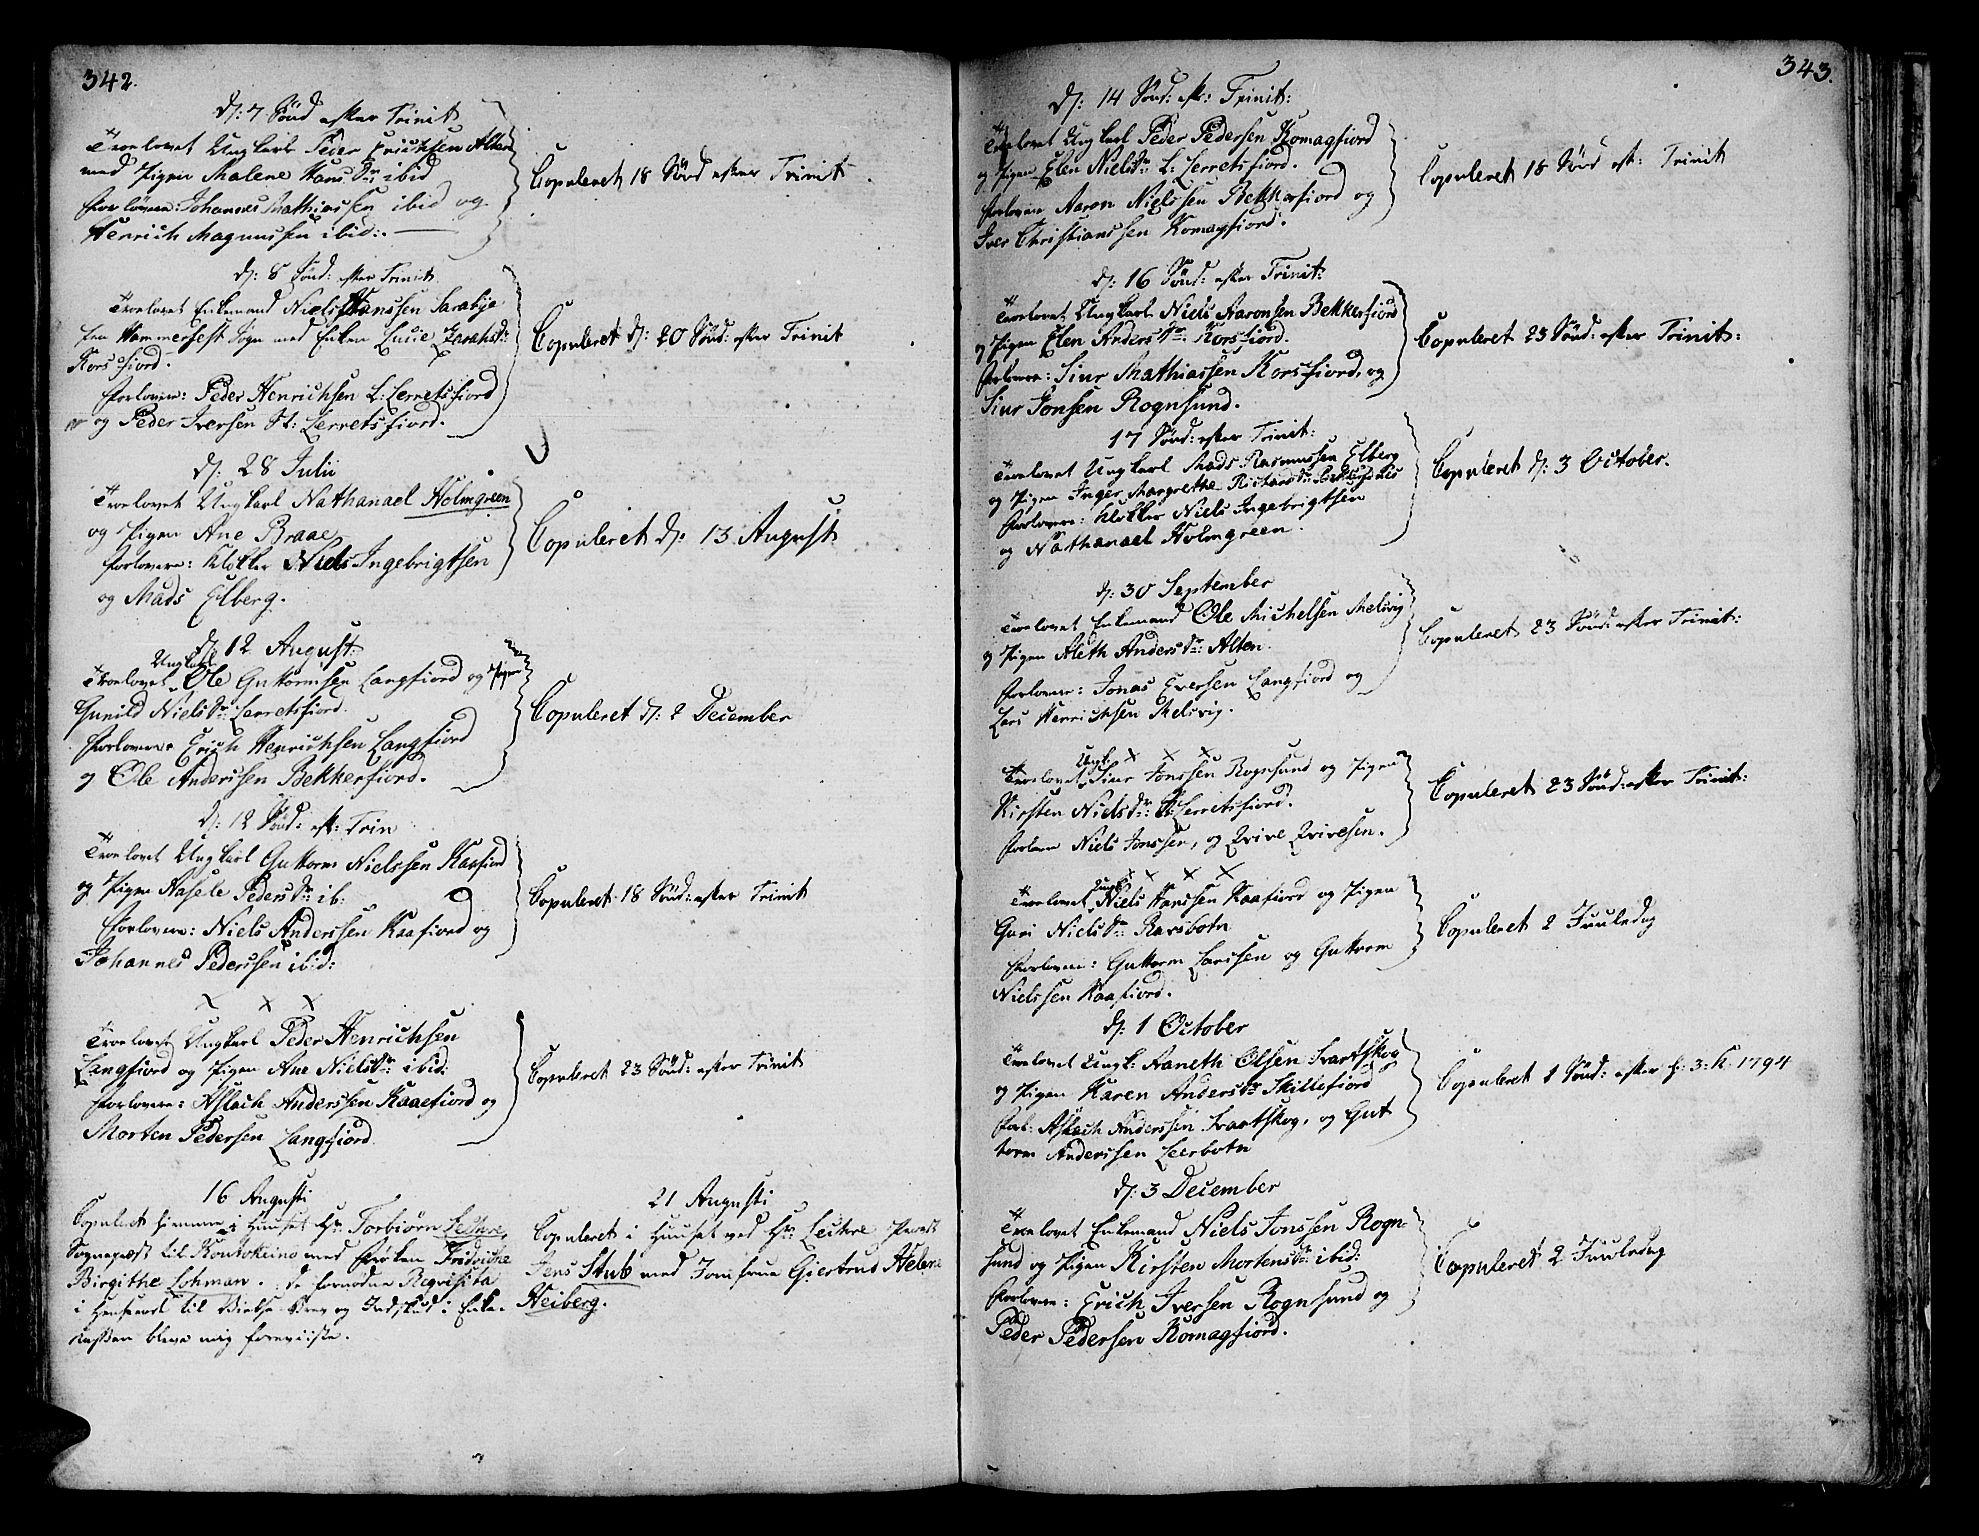 SATØ, Talvik sokneprestkontor, H/Ha/L0005kirke: Ministerialbok nr. 5, 1772-1798, s. 342-343